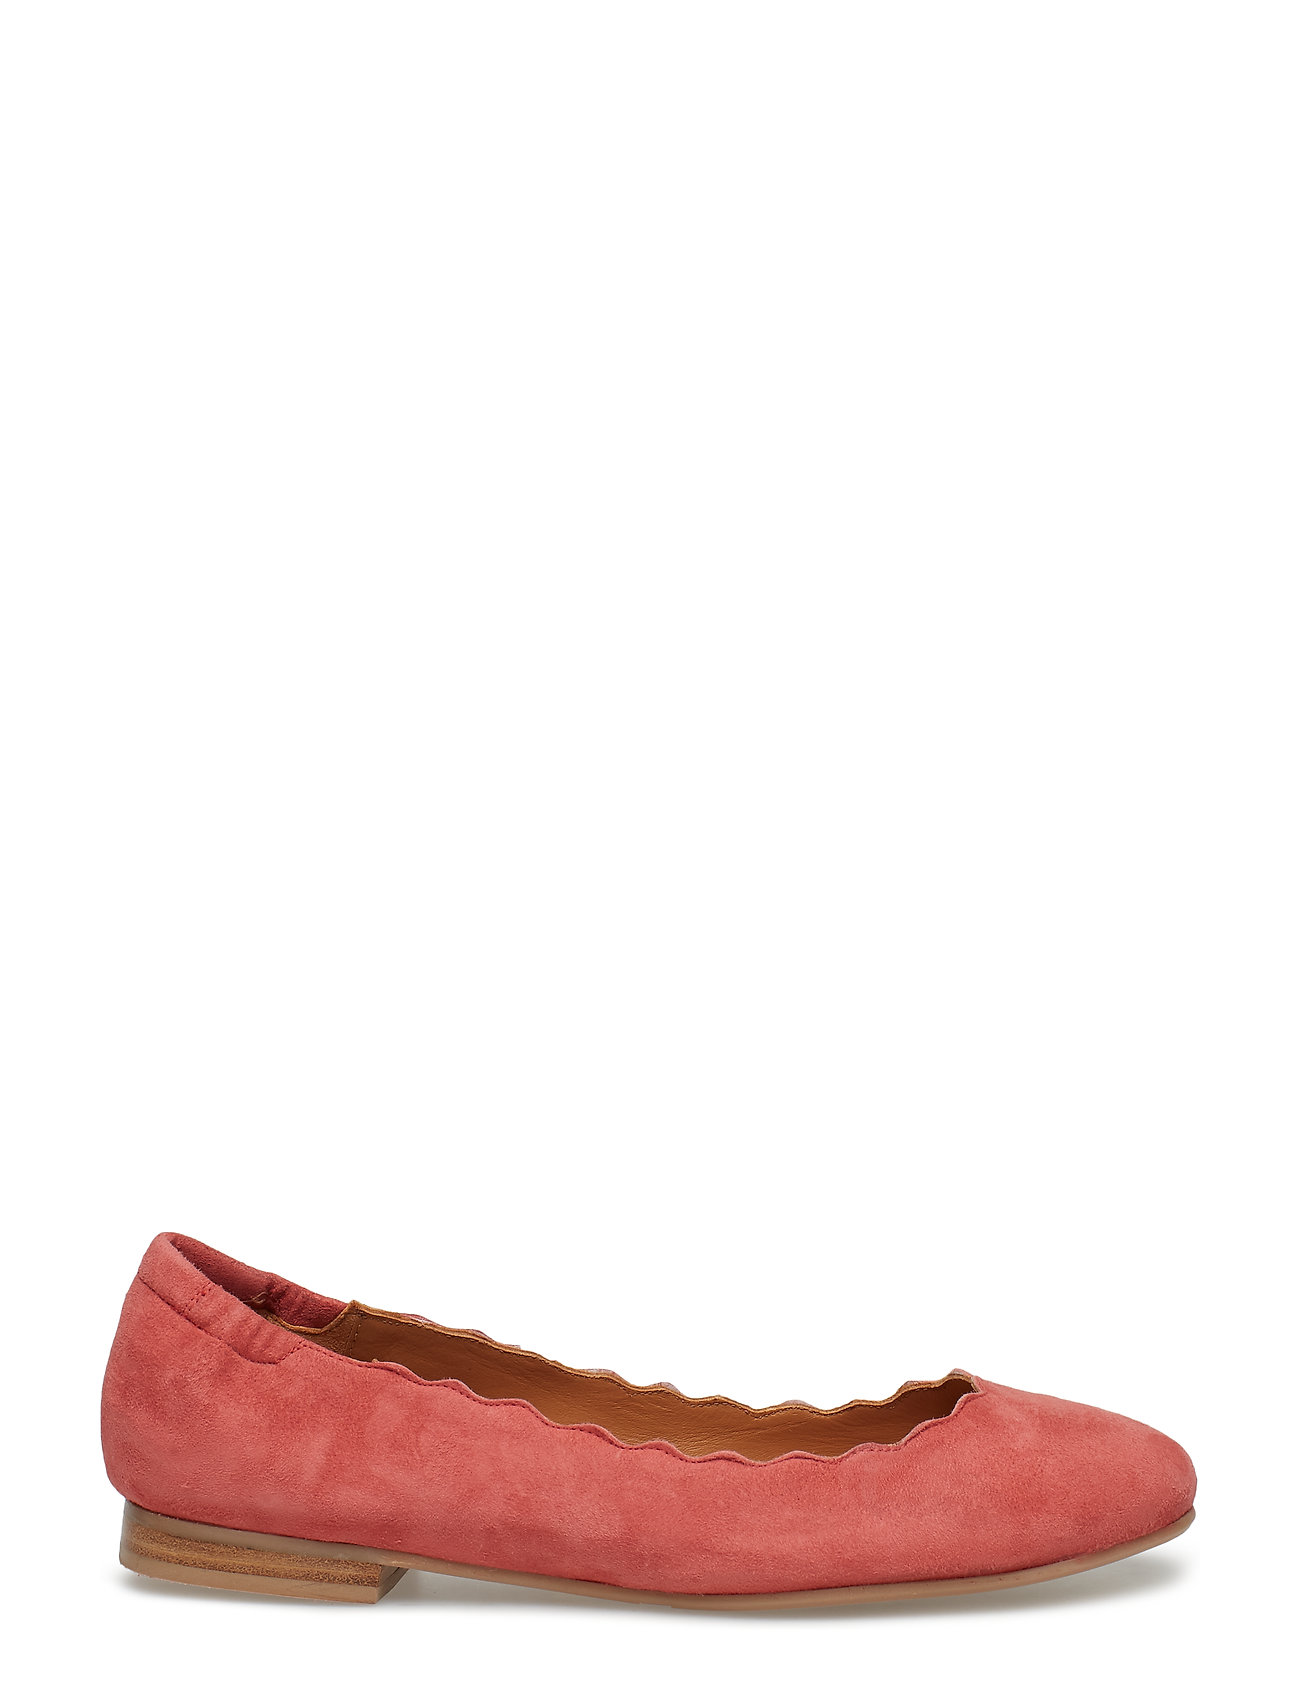 Shoes 8660 Ballerinasko Ballerinaer Brun Billi Bi